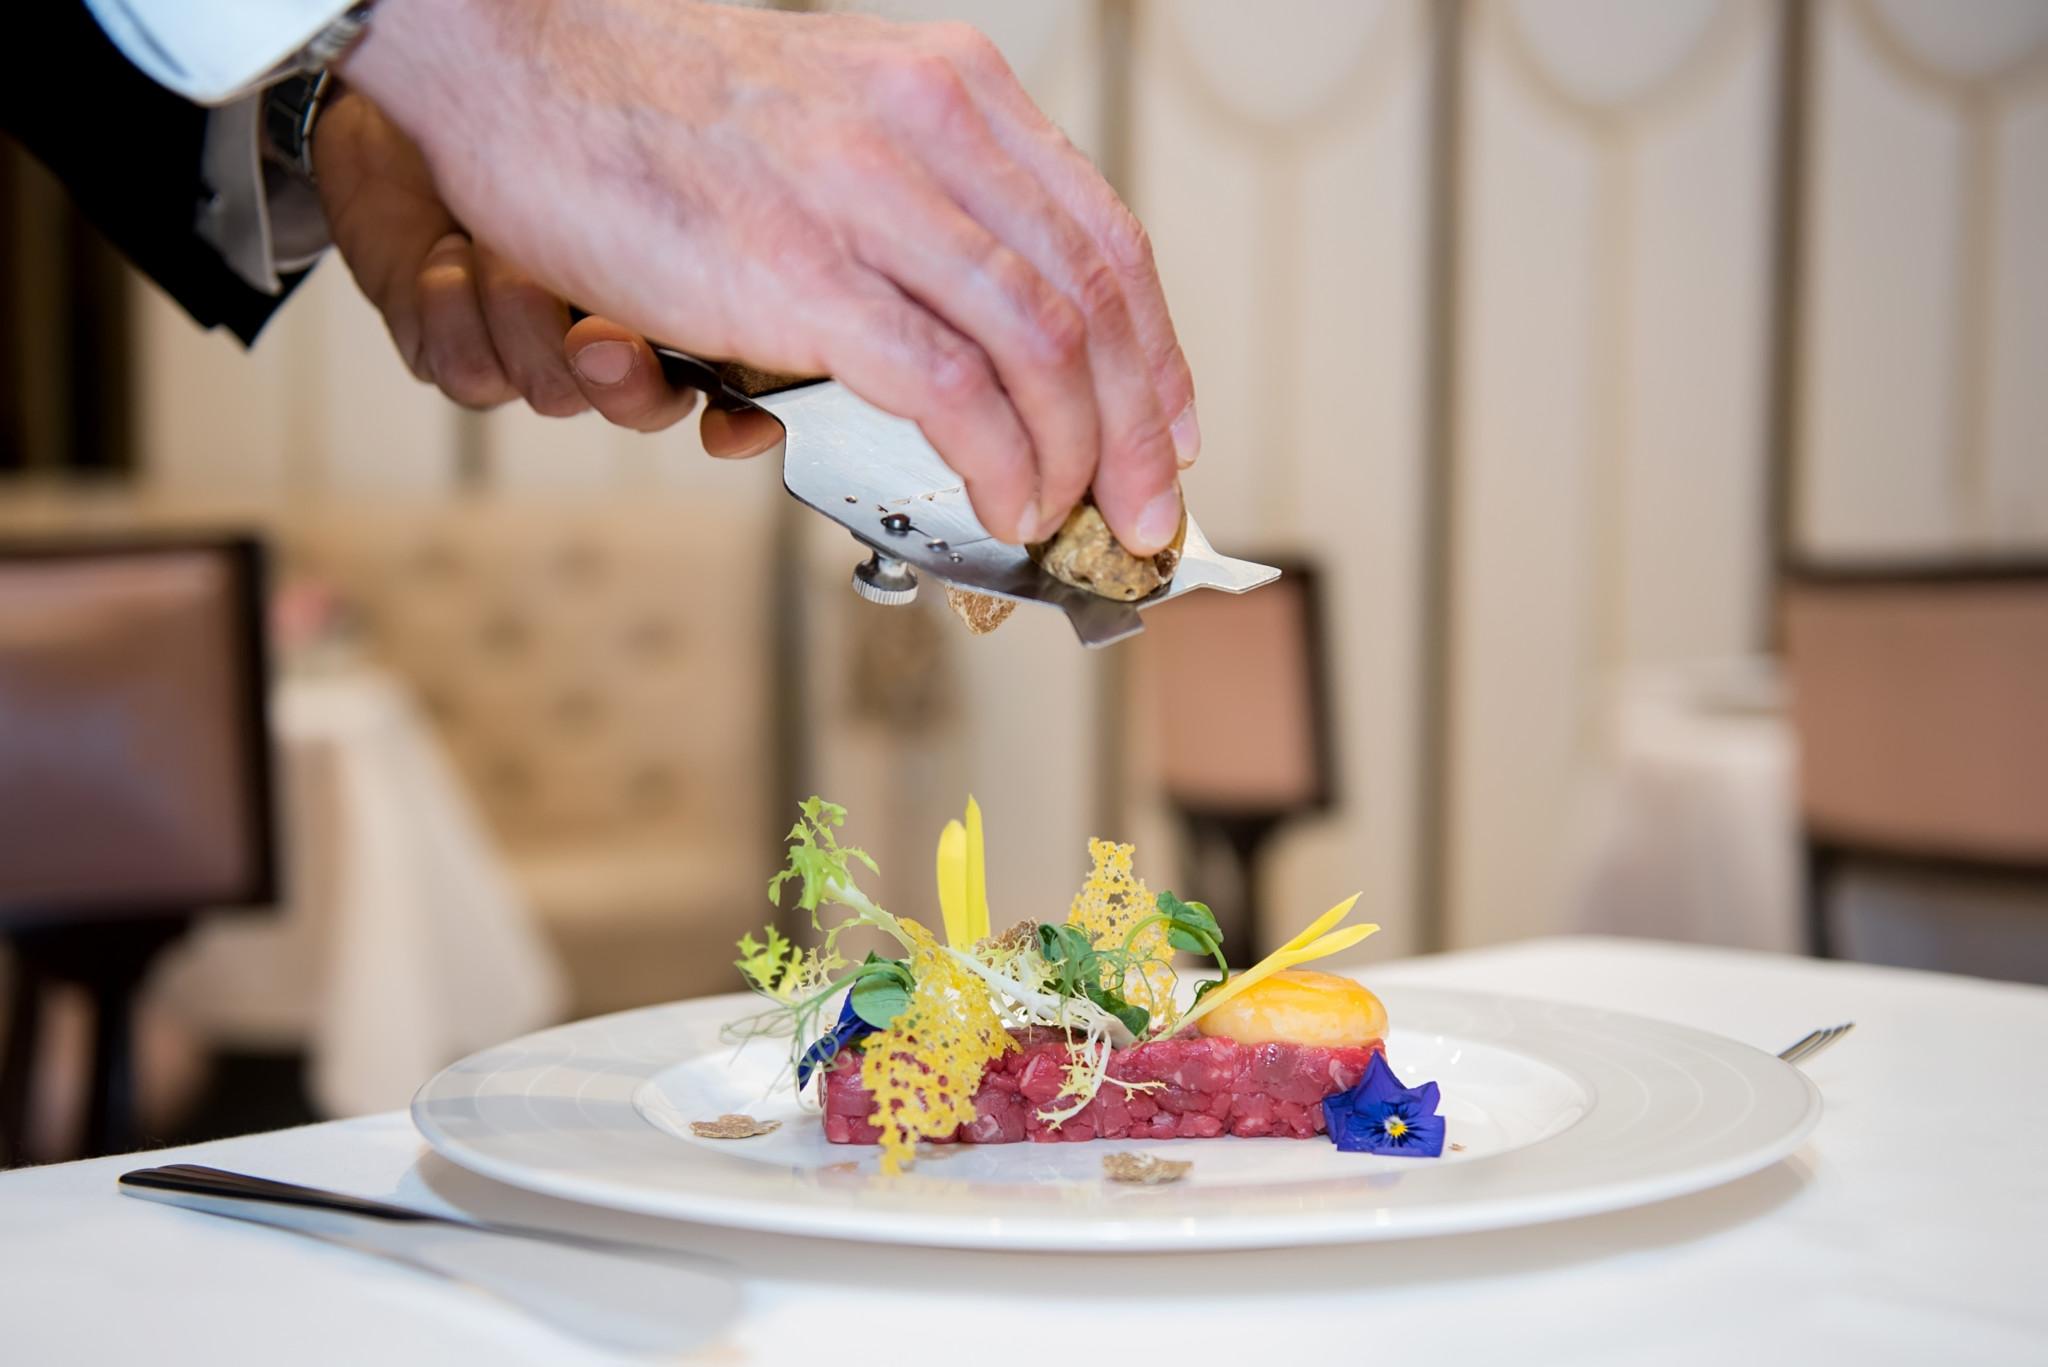 the-wellesley-oval-restaurant-beef-tartare-confit-yolk-hazelnut-truffle-shaving-1